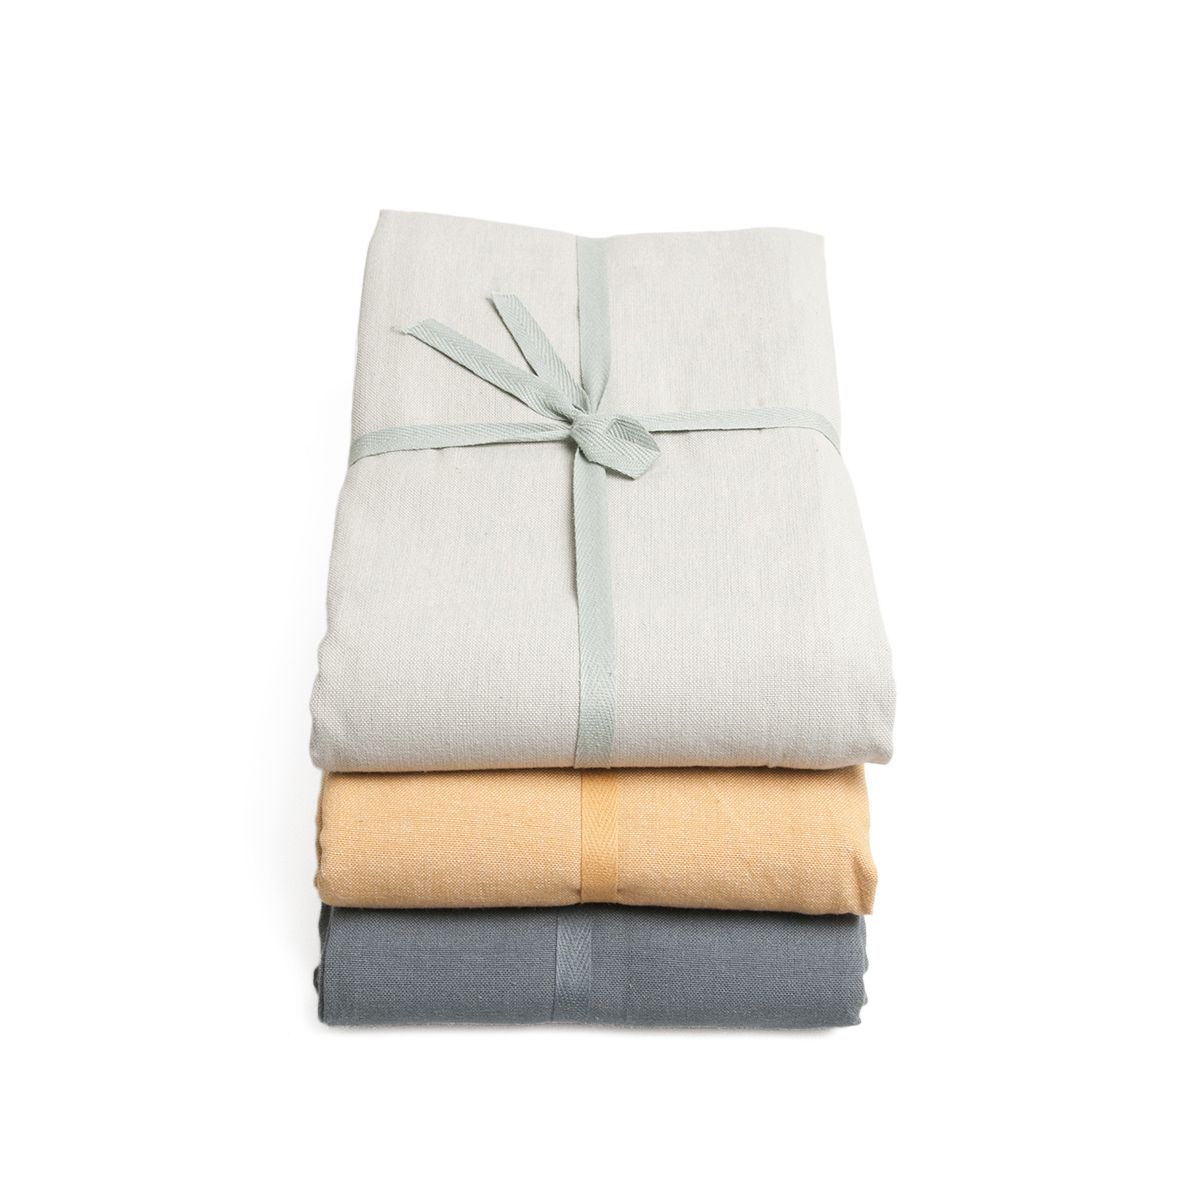 Ongekend Tafelkleden vind je bij dille-kamille.nl in zowel linnen als YQ-57